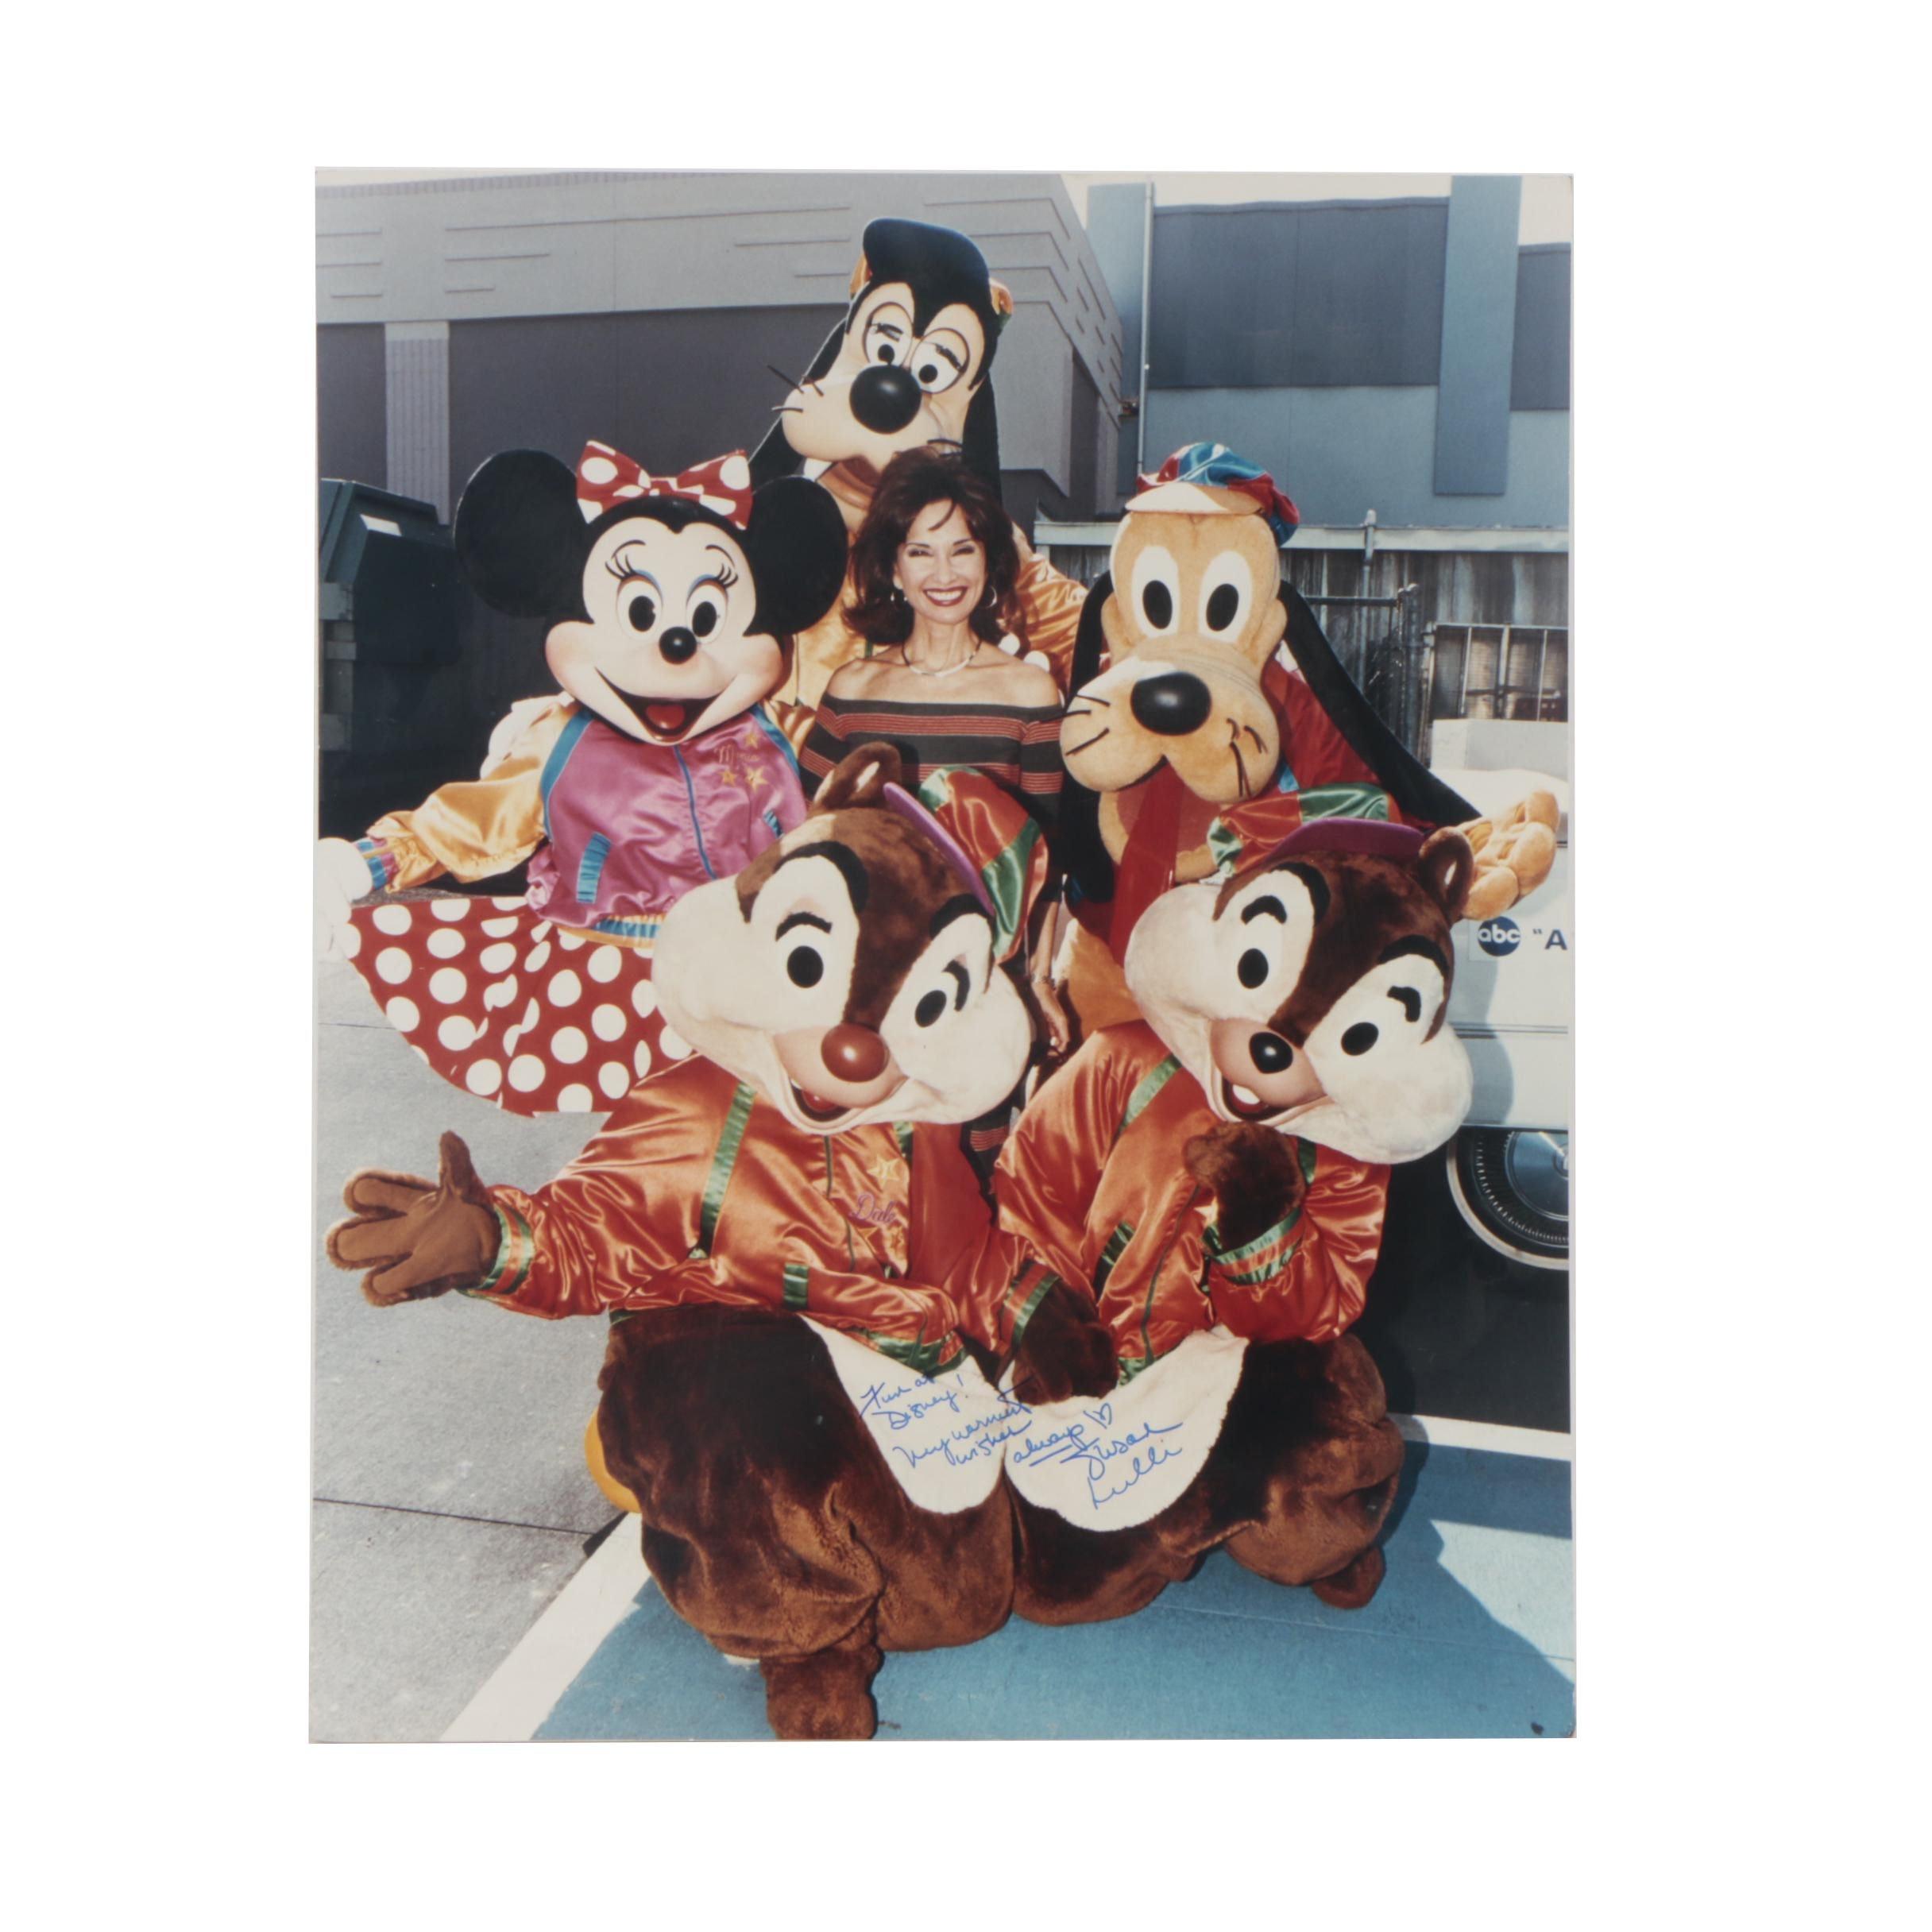 Susan Lucci Autographed Disneyland Photograph